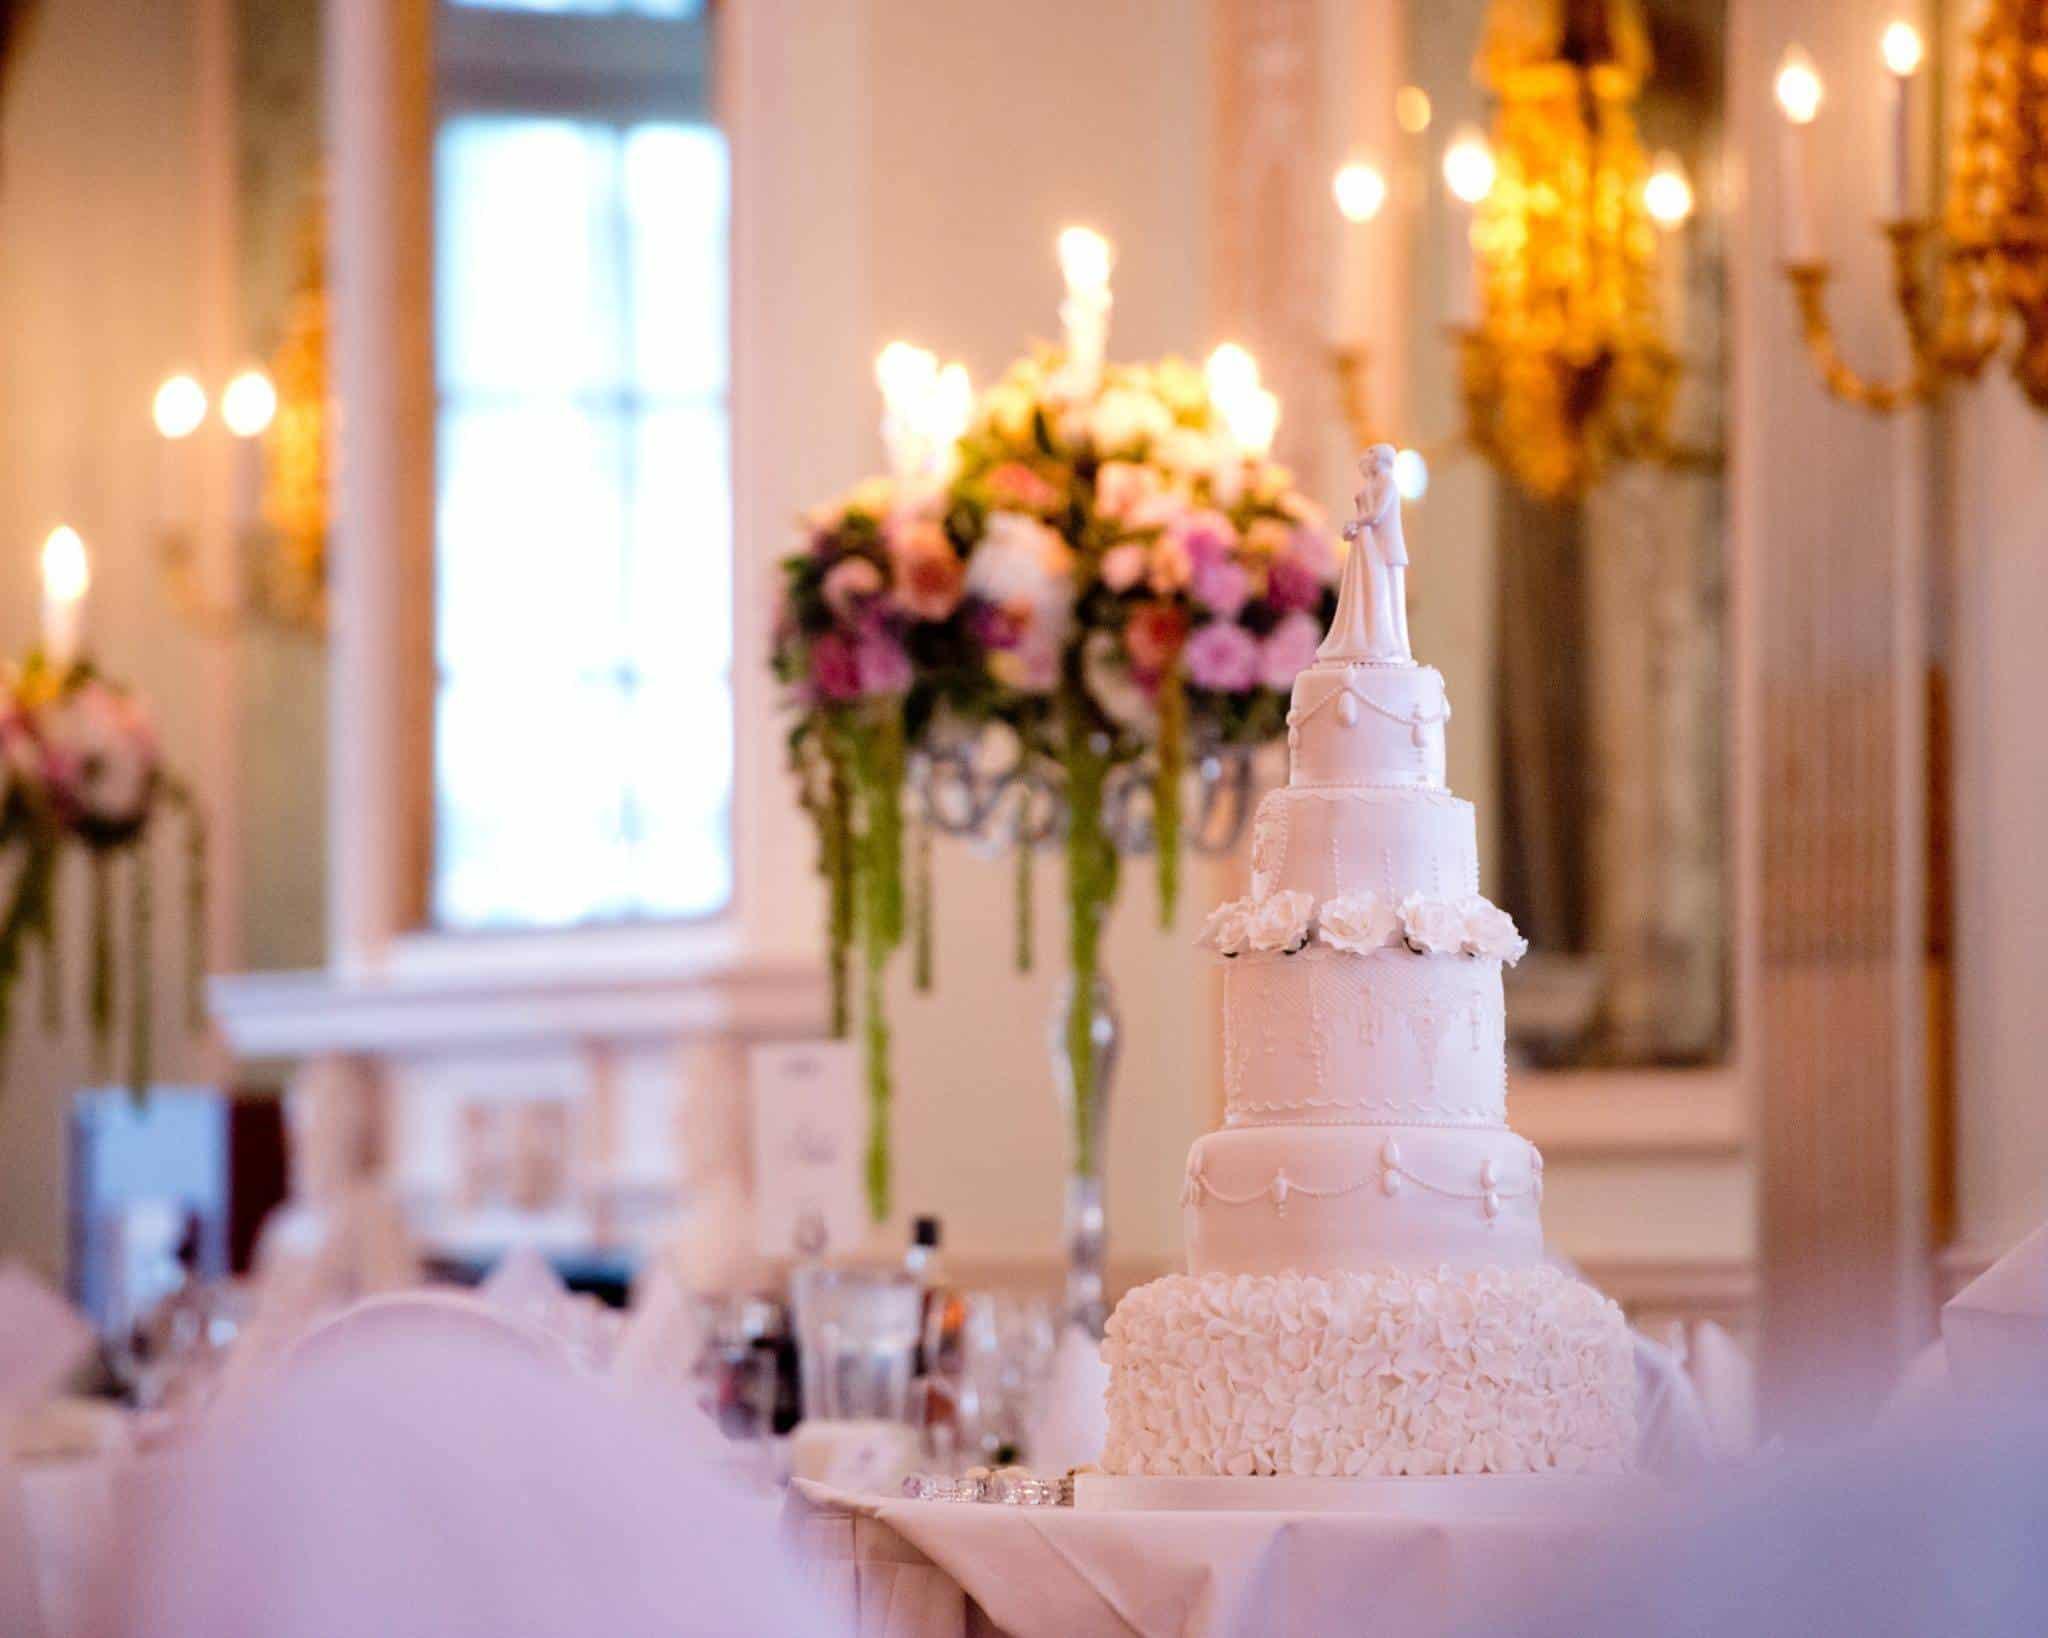 5 Star Real Weddings